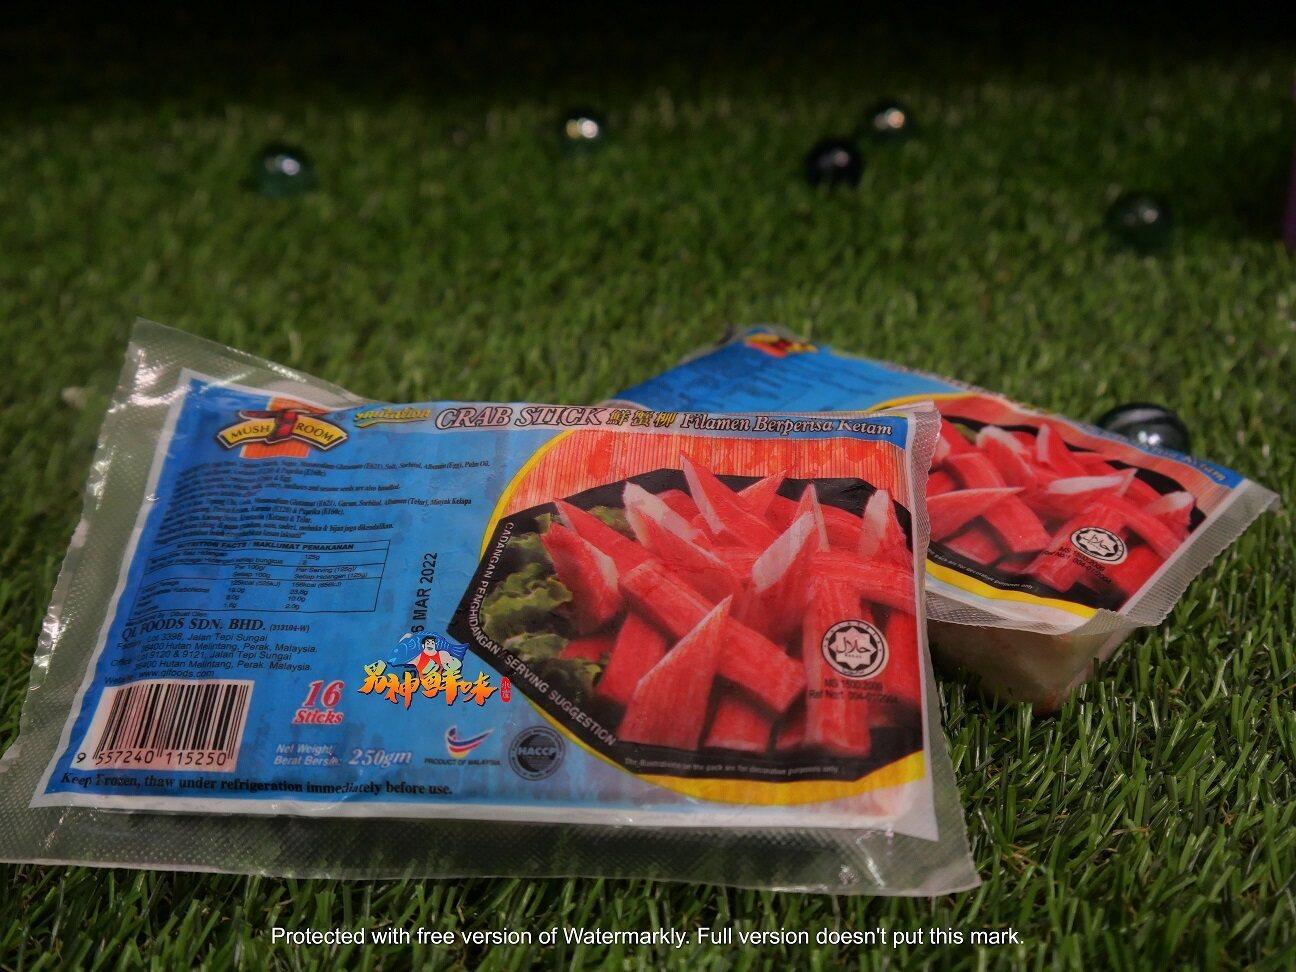 Mushroom Imitation Crab Stick 16Pcs 250G 鲜蟹柳